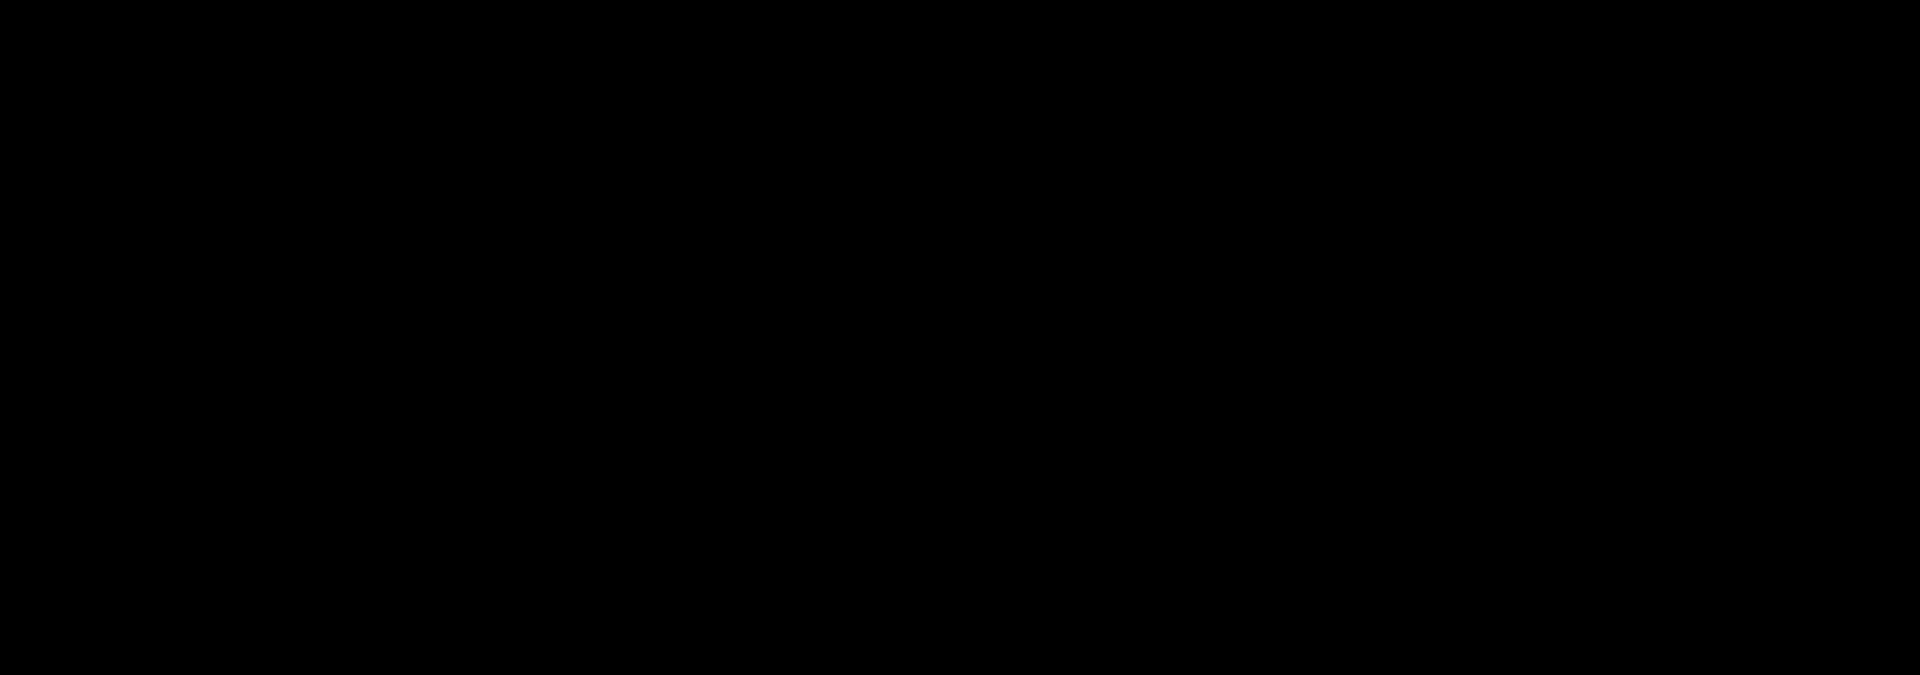 سترات الصوديوم Sodium Citrate